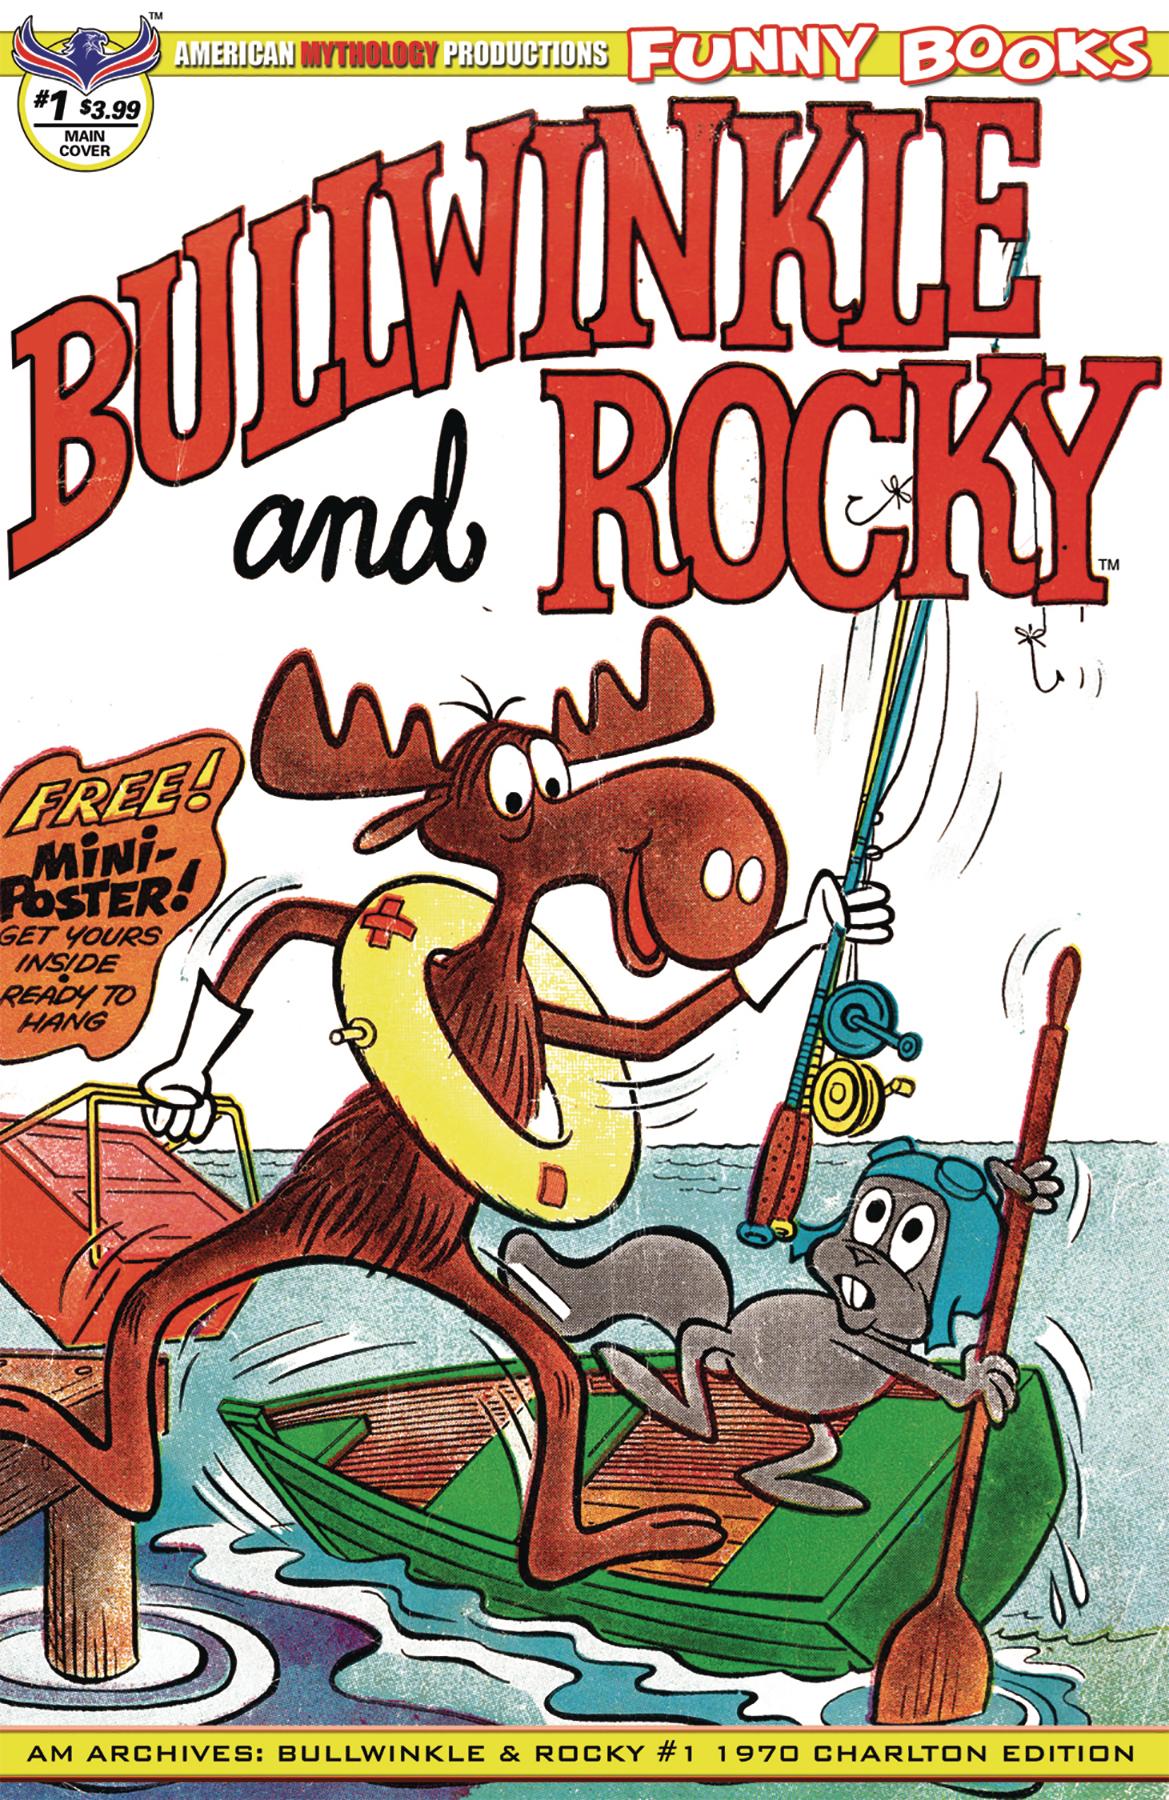 AM ARCHIVES BULLWINKLE & ROCKY #1 CHARLTON ED